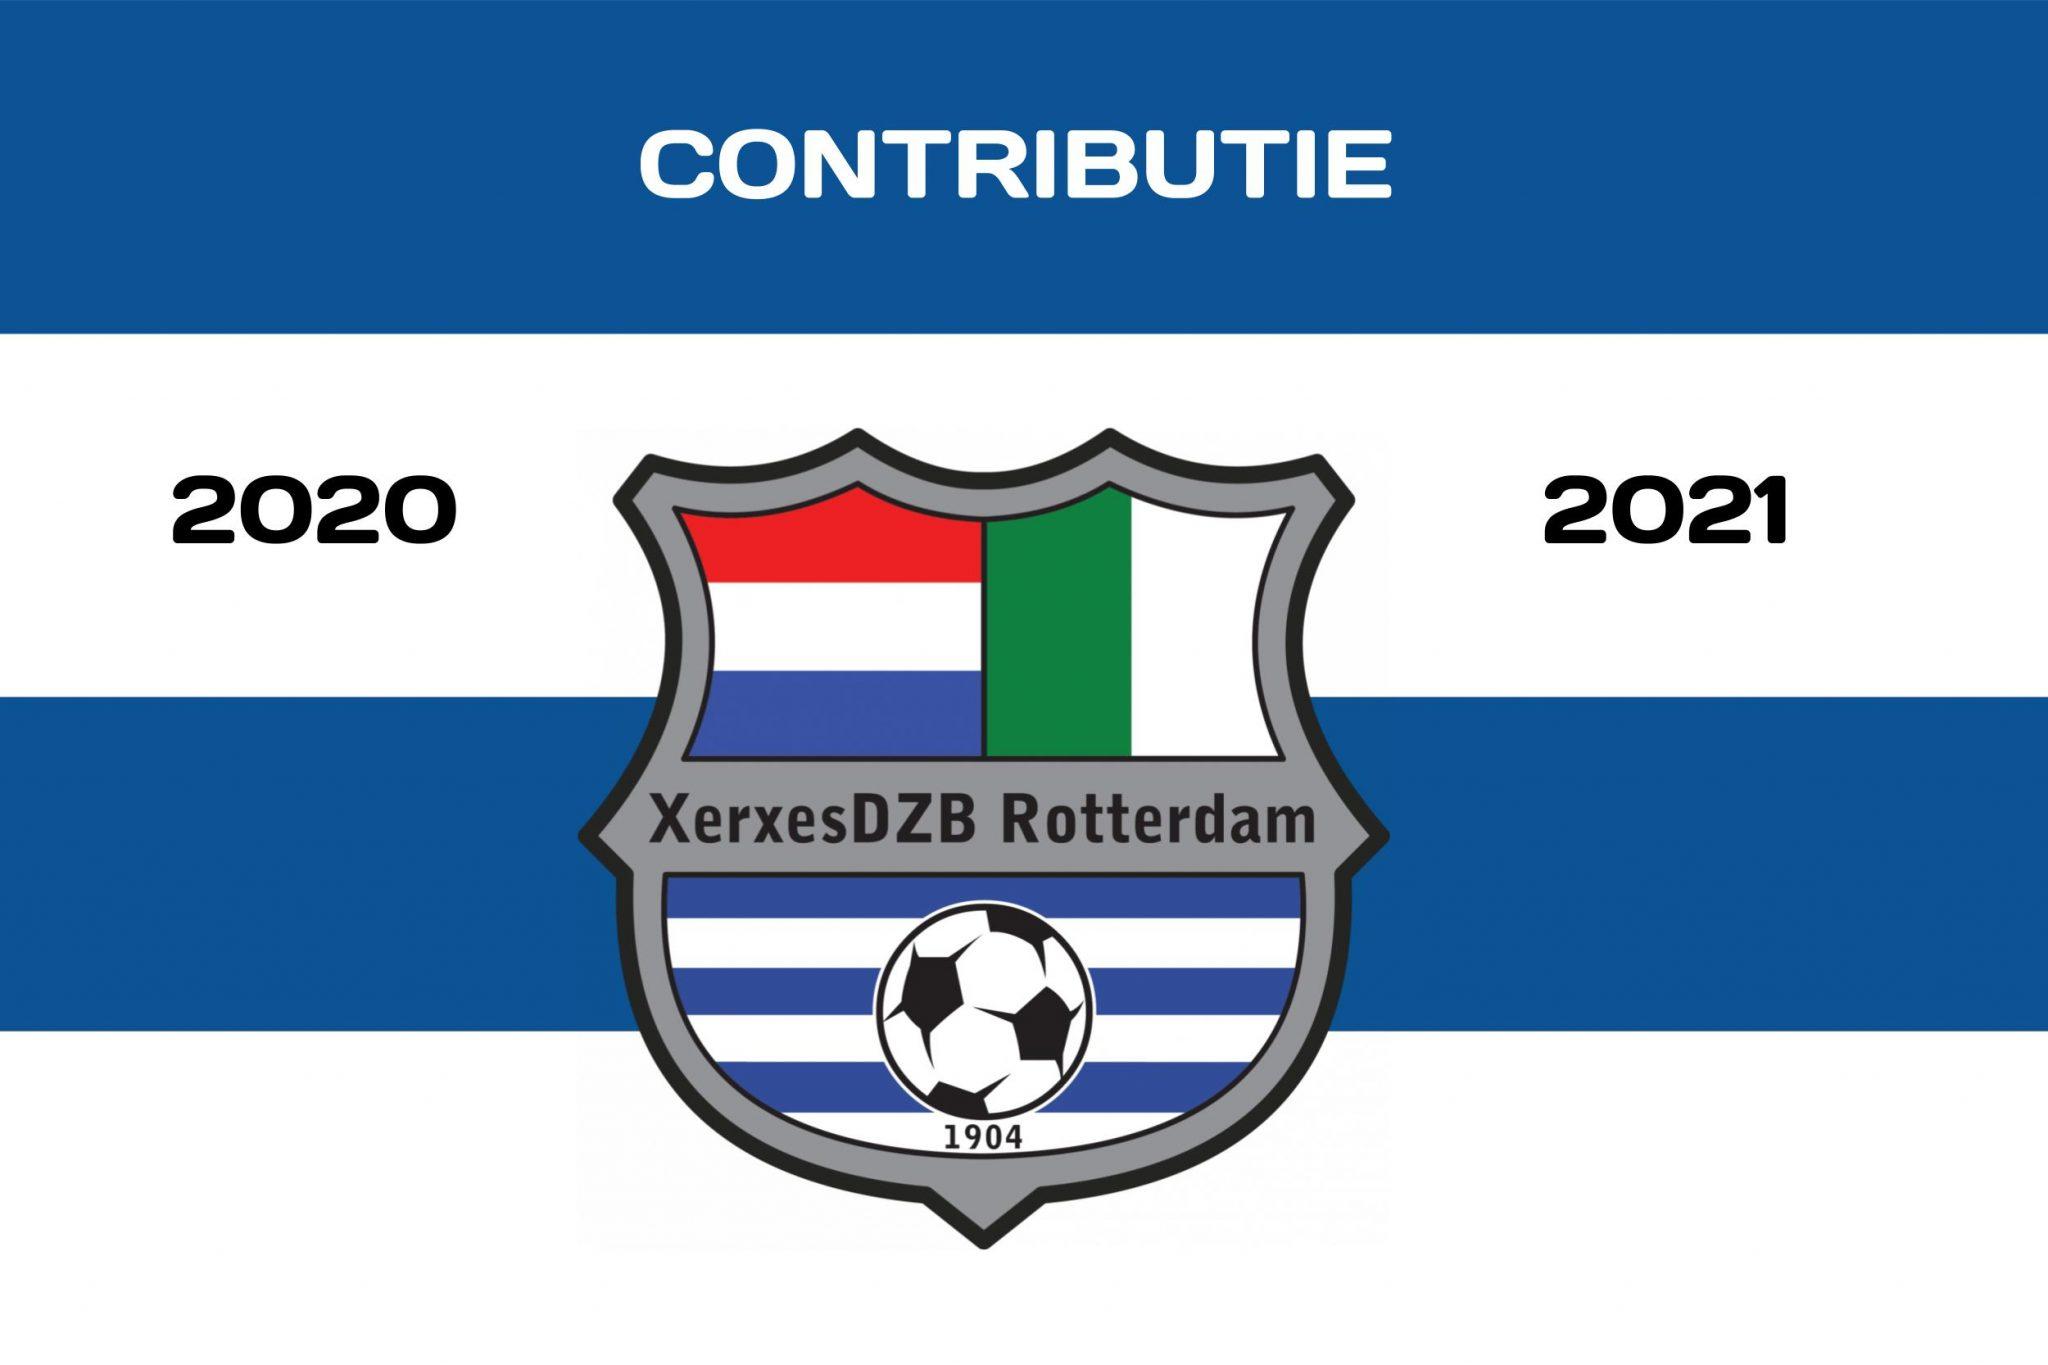 Contributiebrief 2020-2021